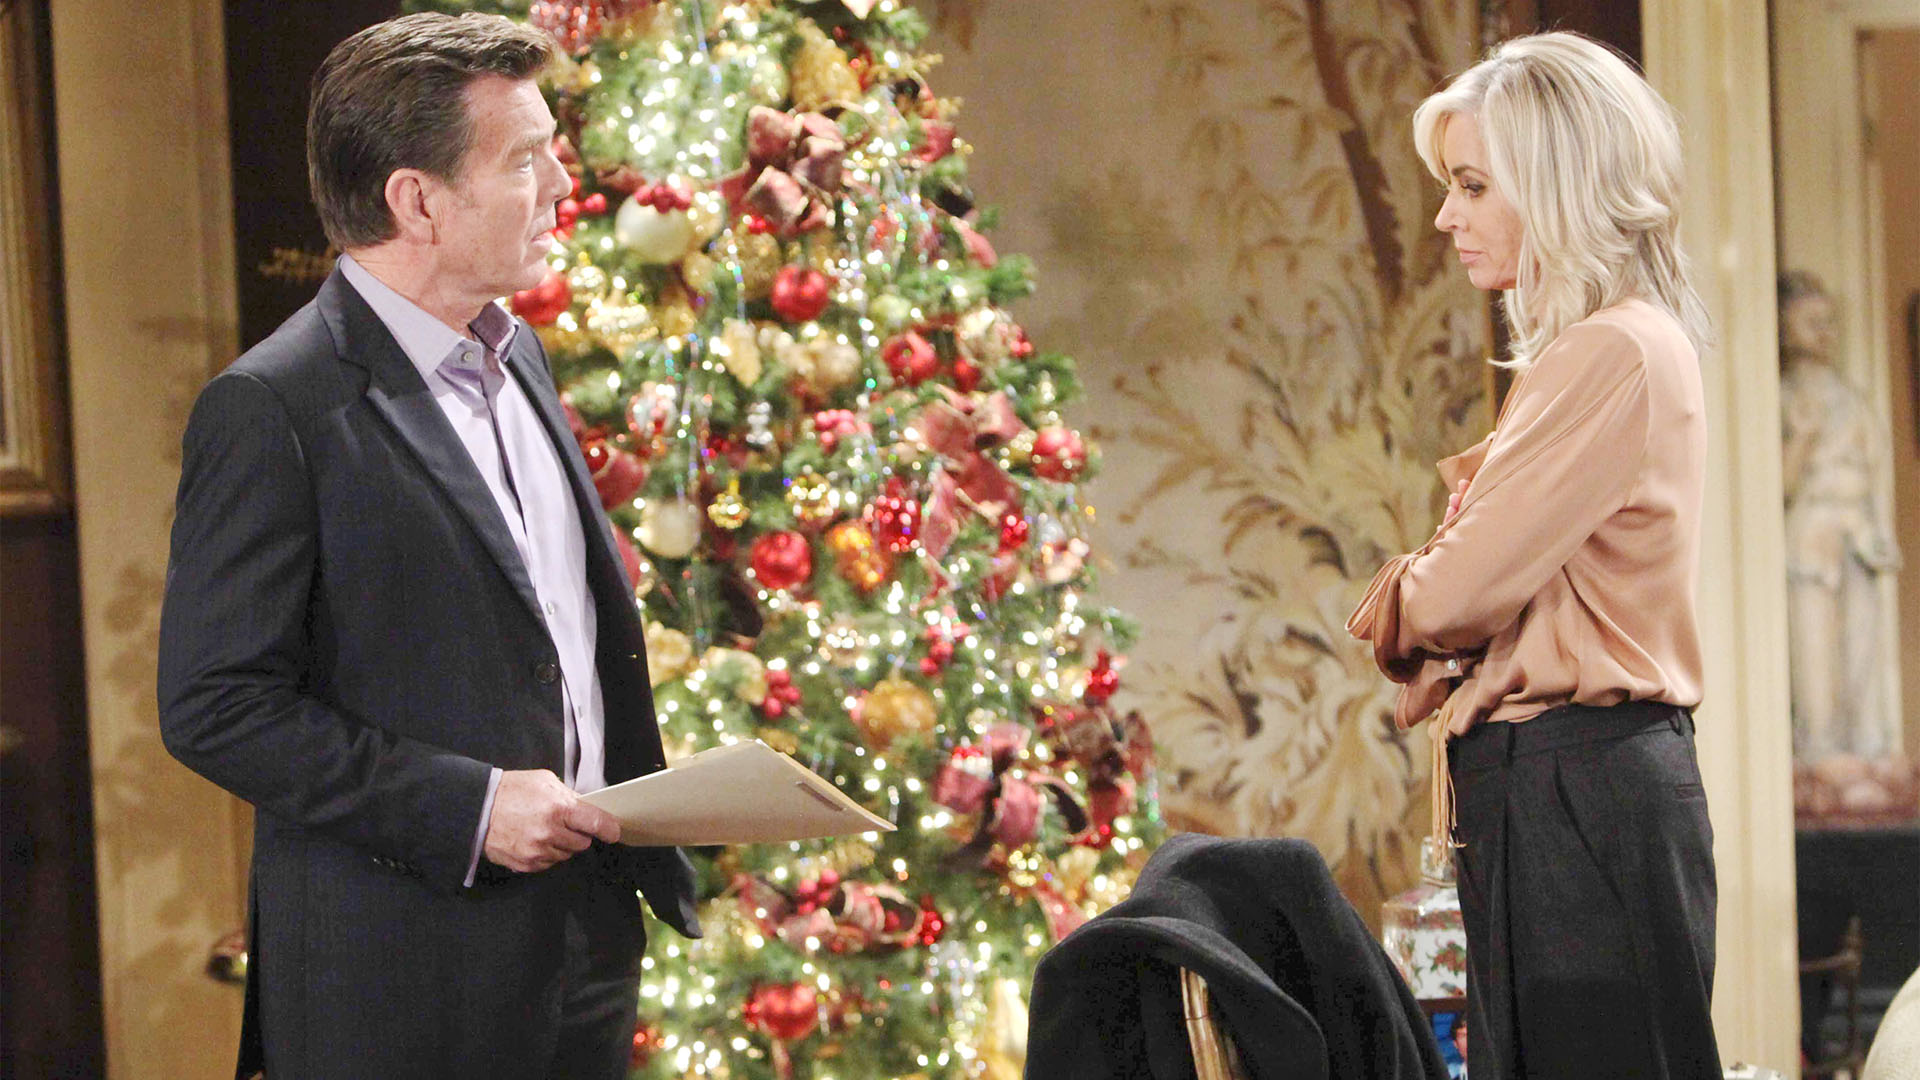 Jack struggles to care for Dina.